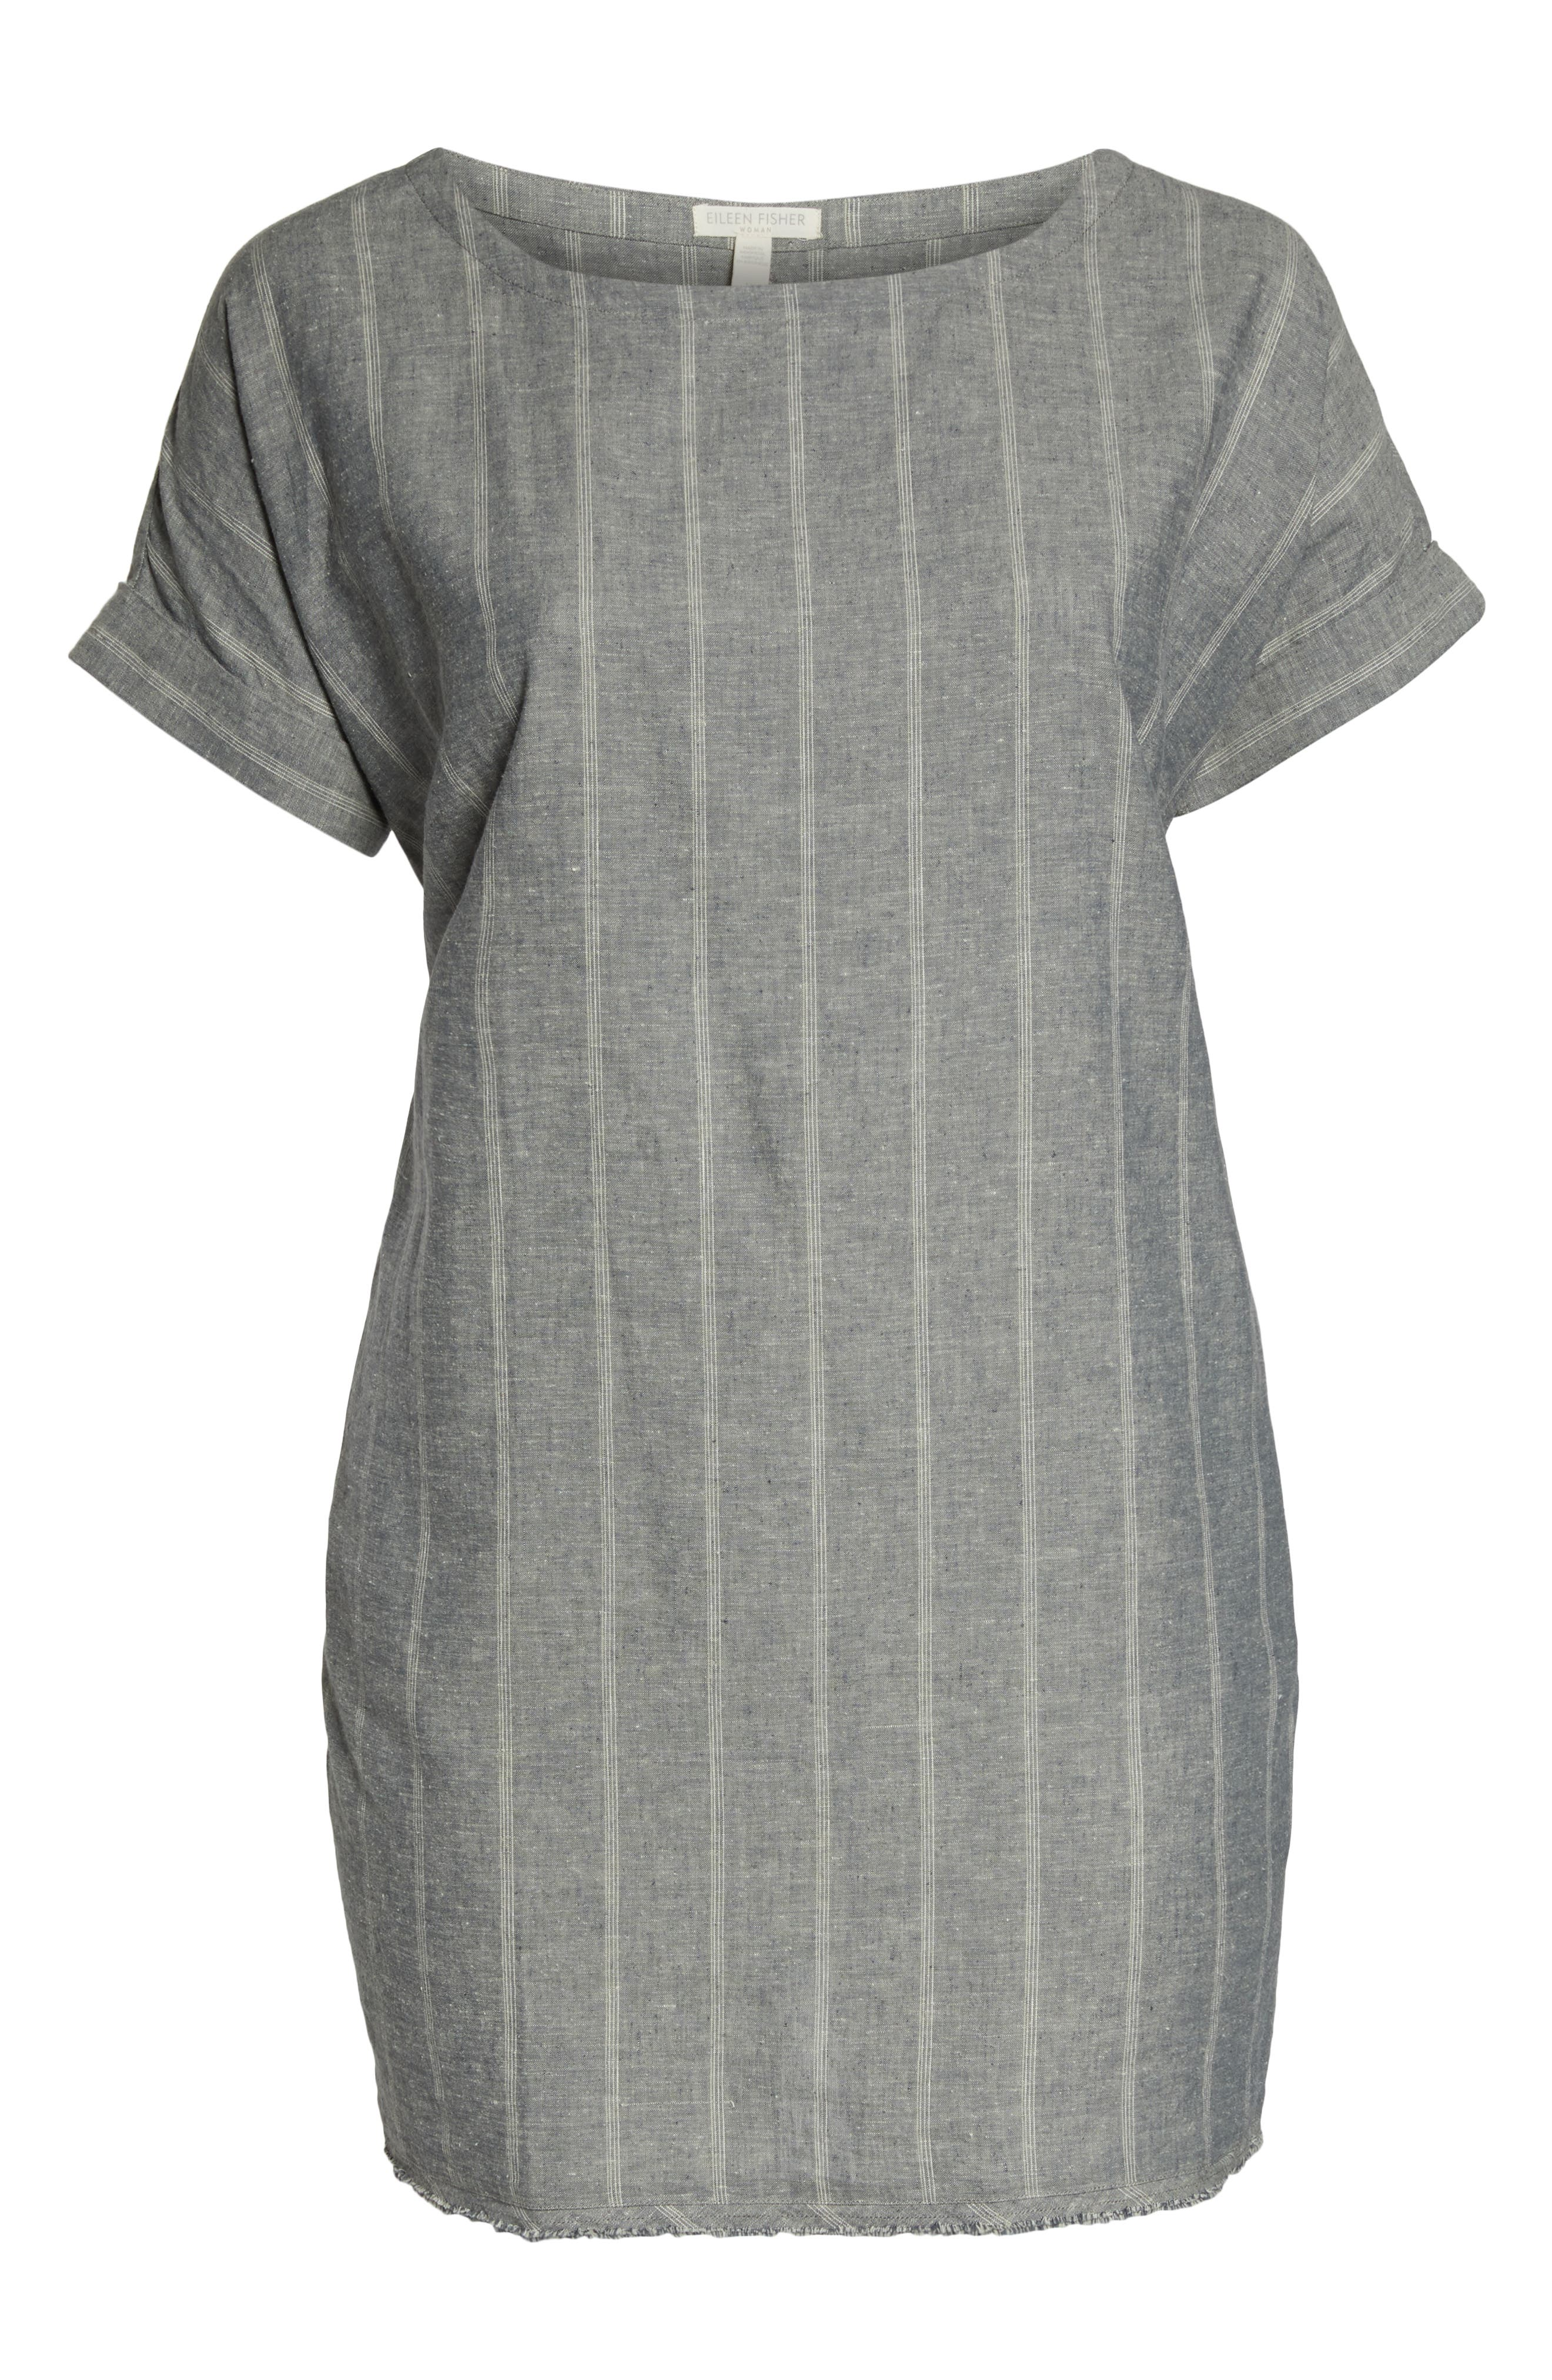 EILEEN FISHER,                             Stripe Hemp & Organic Cotton Shift Dress,                             Alternate thumbnail 7, color,                             MOON